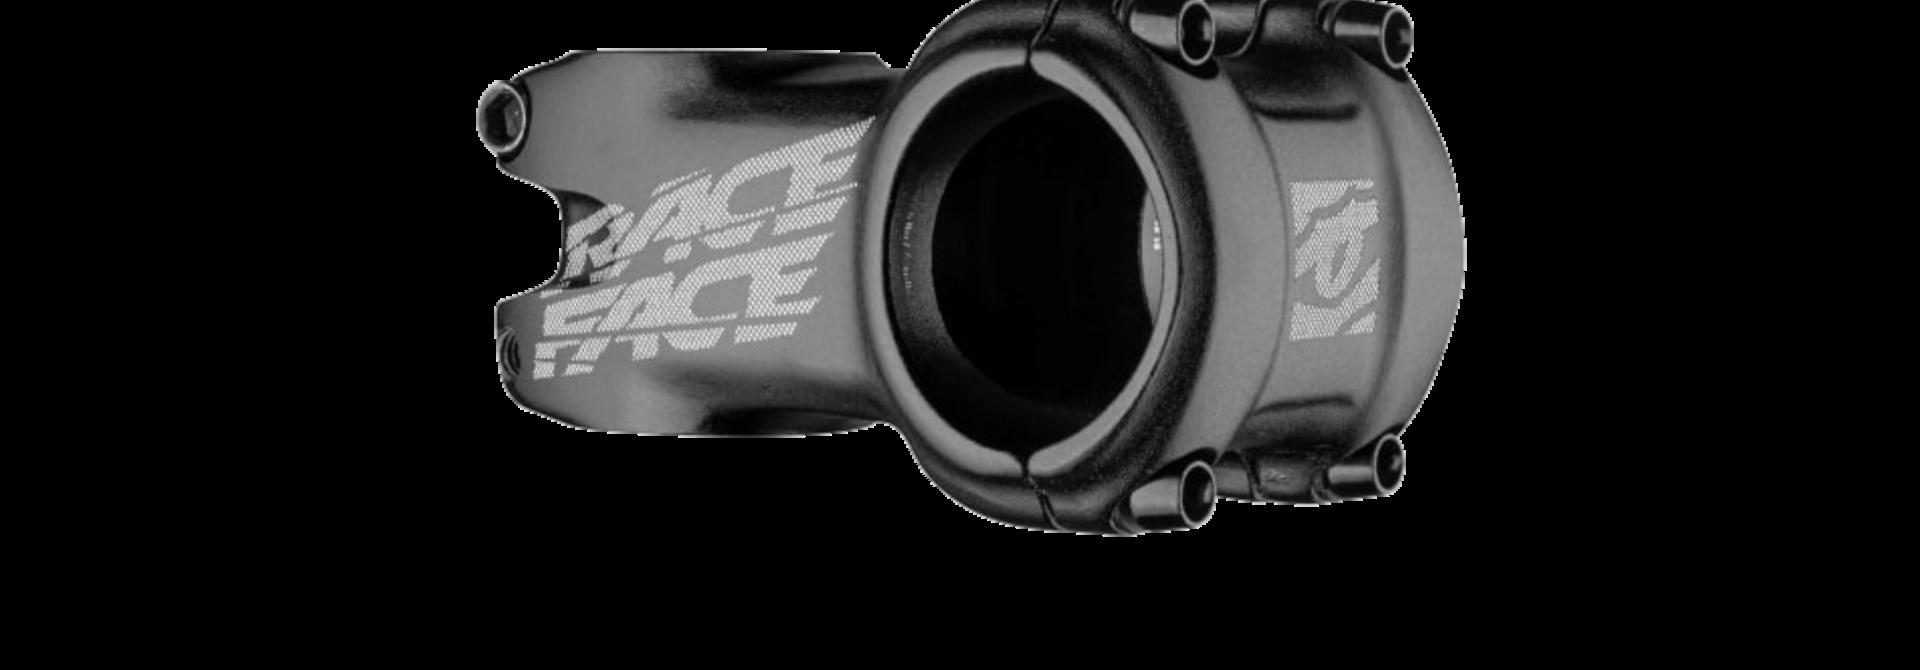 RaceFace Chester Stem 35mm ,60mm, Black